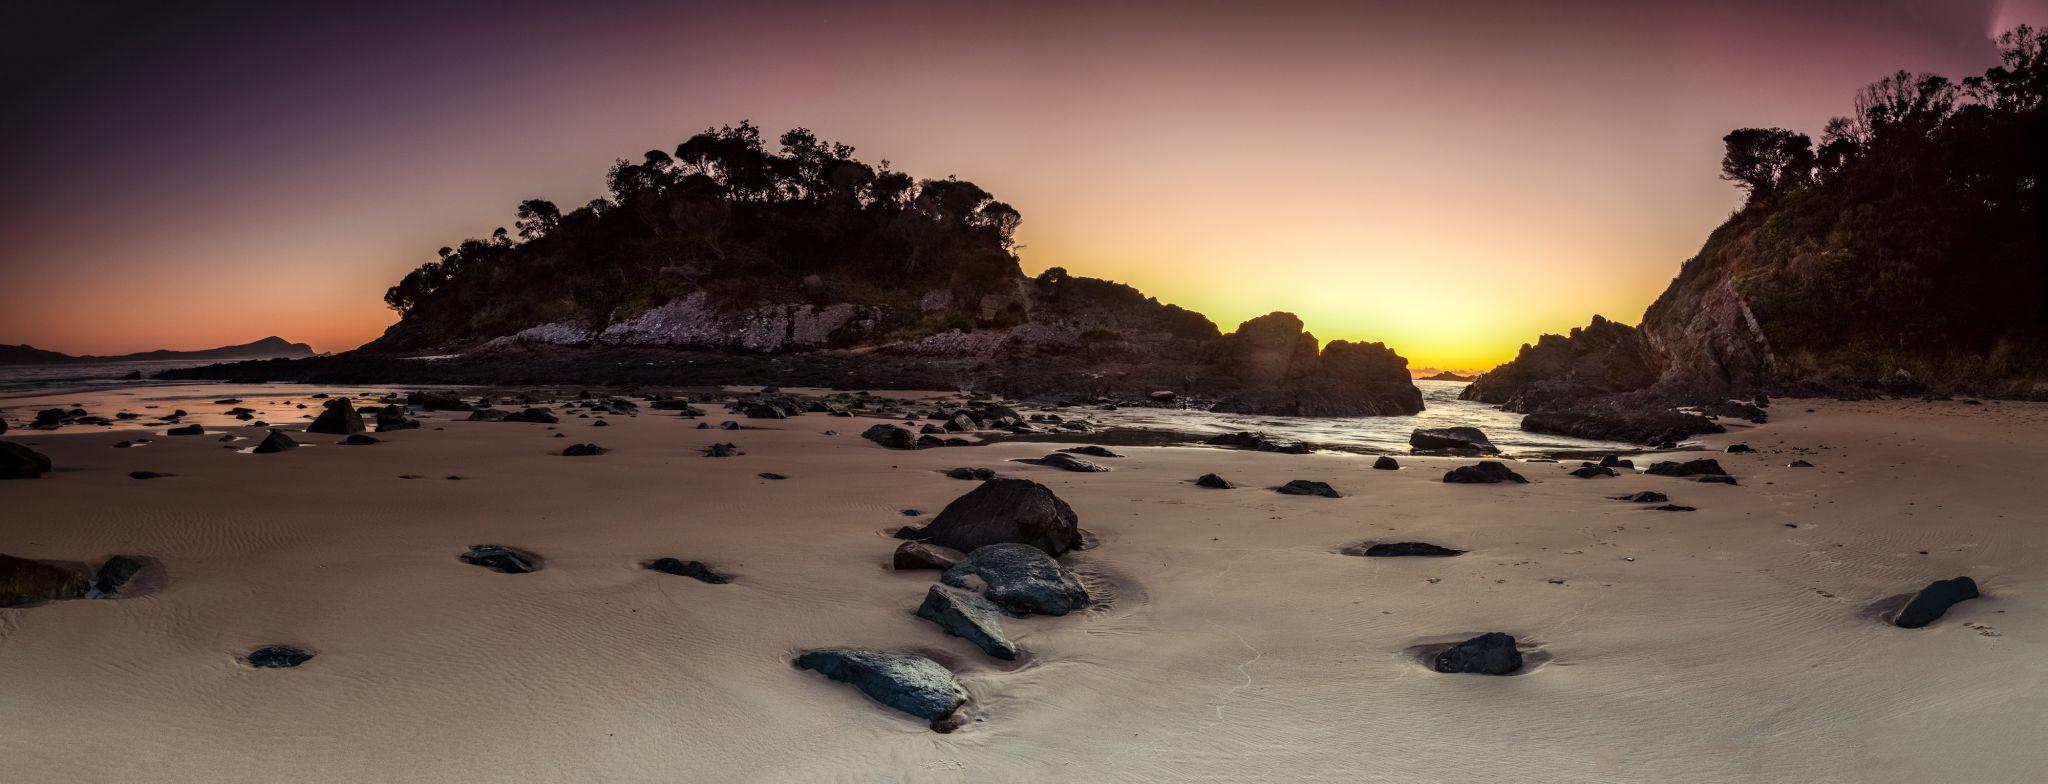 Seal Rocks headland Number one beach New South Wales, Australia